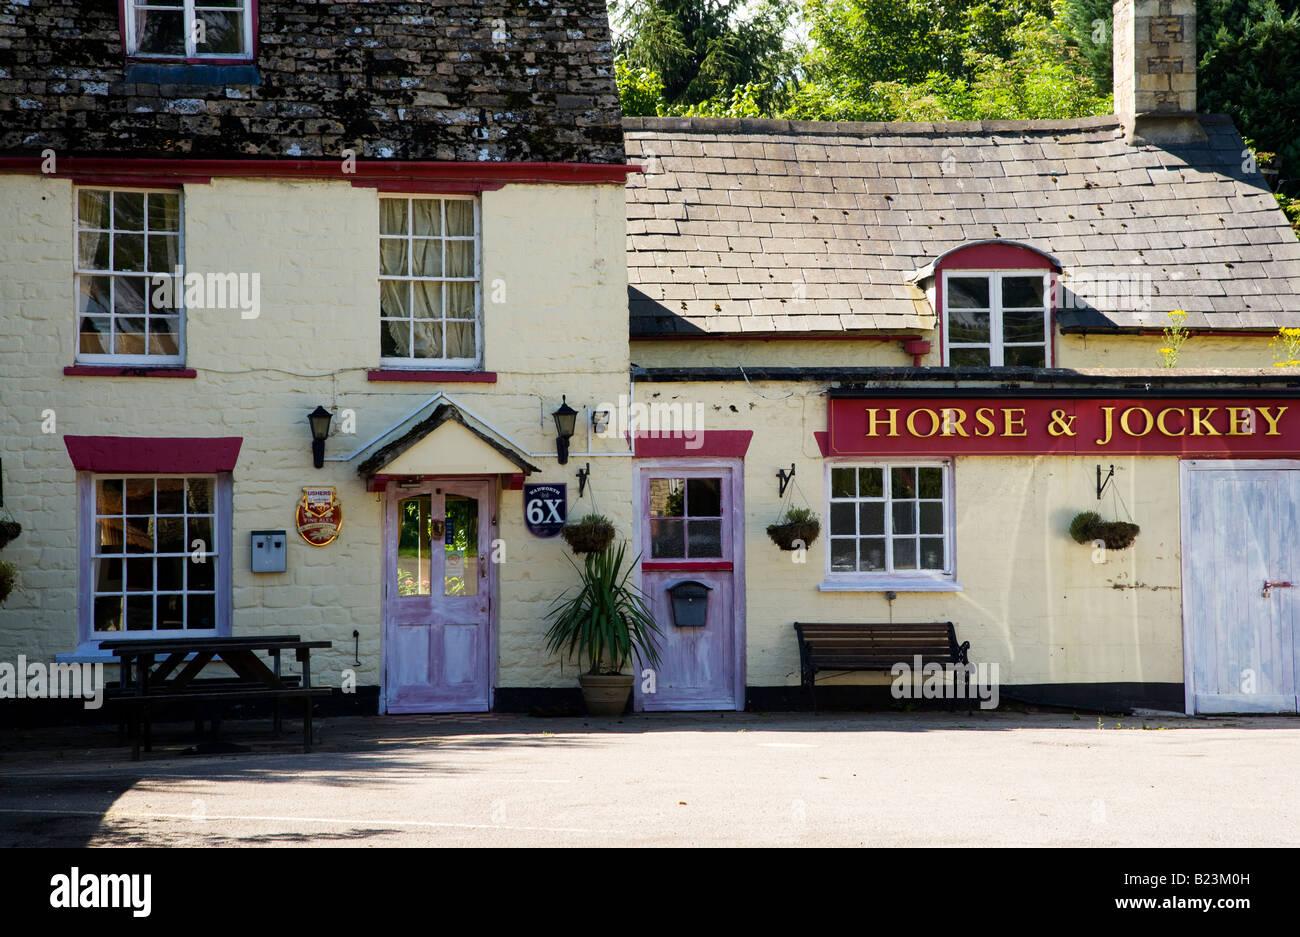 A typical English village pub or inn in Ashton Keynes, Wiltshire, England, UK - Stock Image